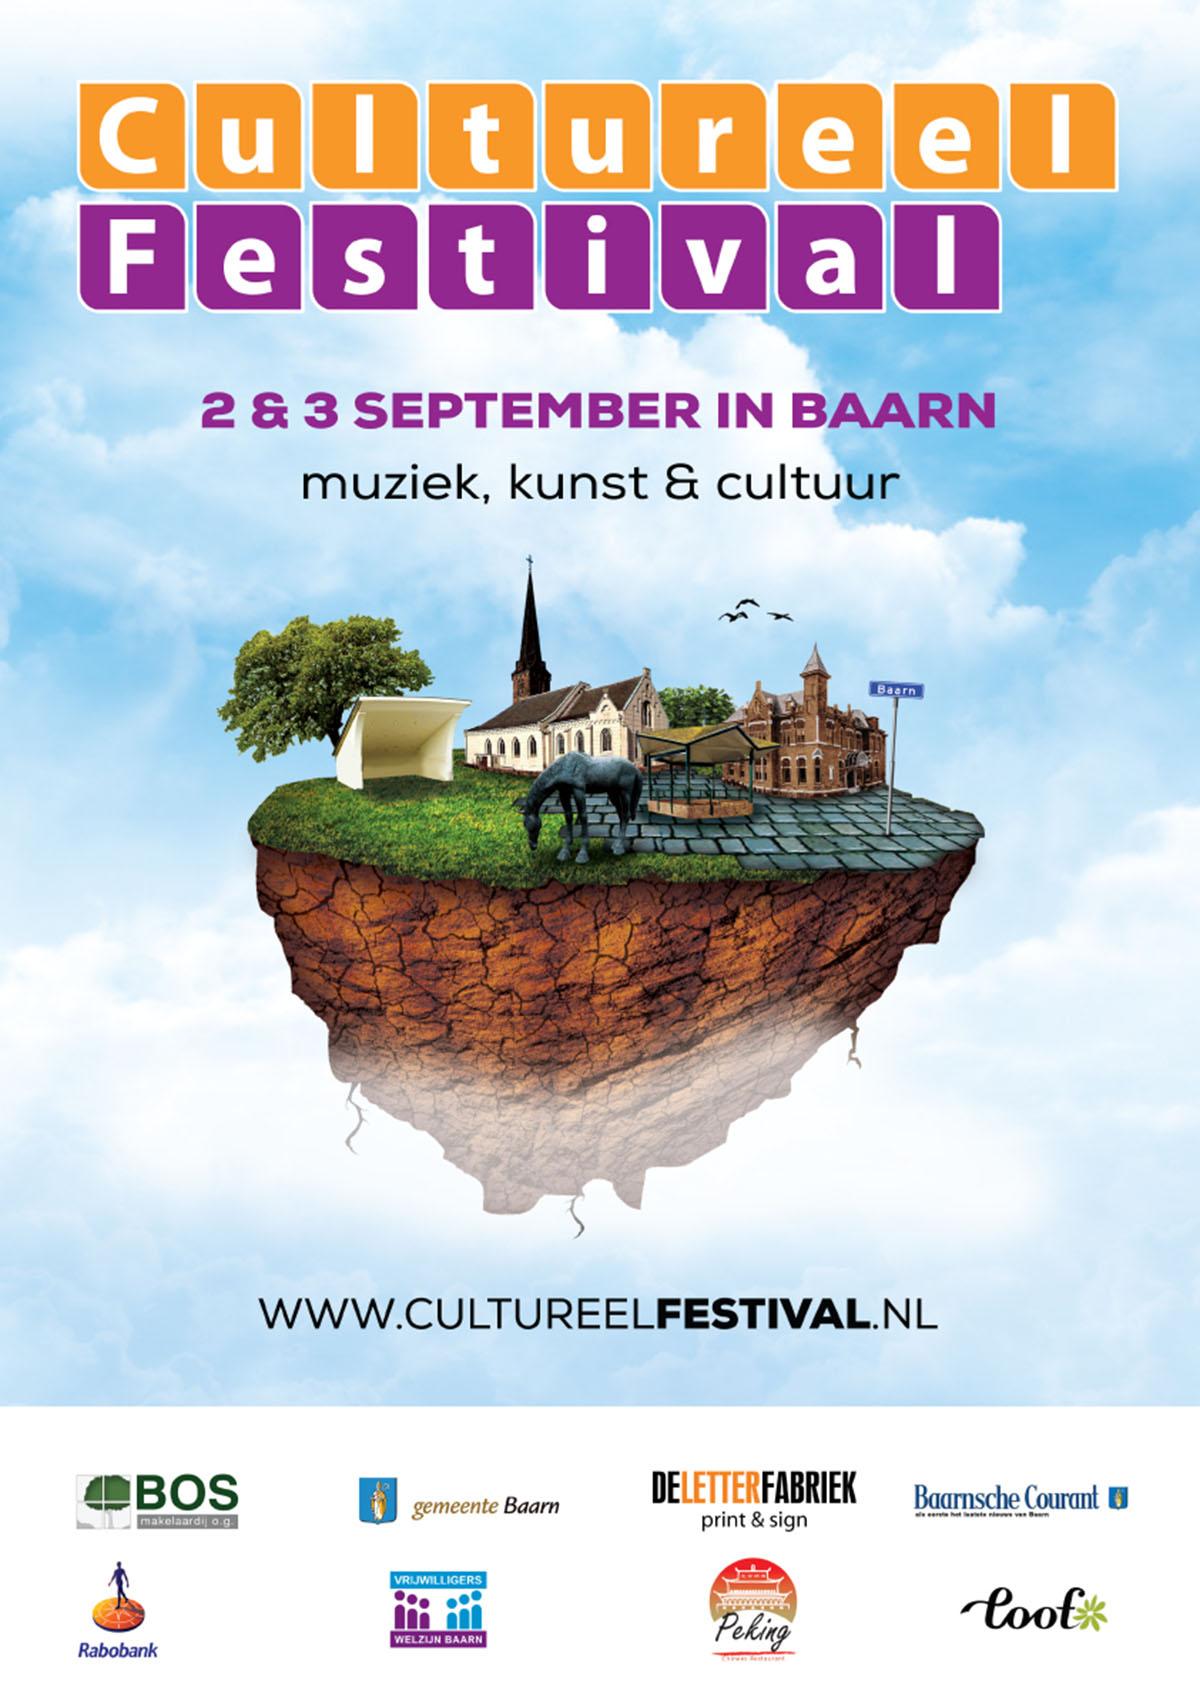 Poster Cultureel Festival Baarn 2016